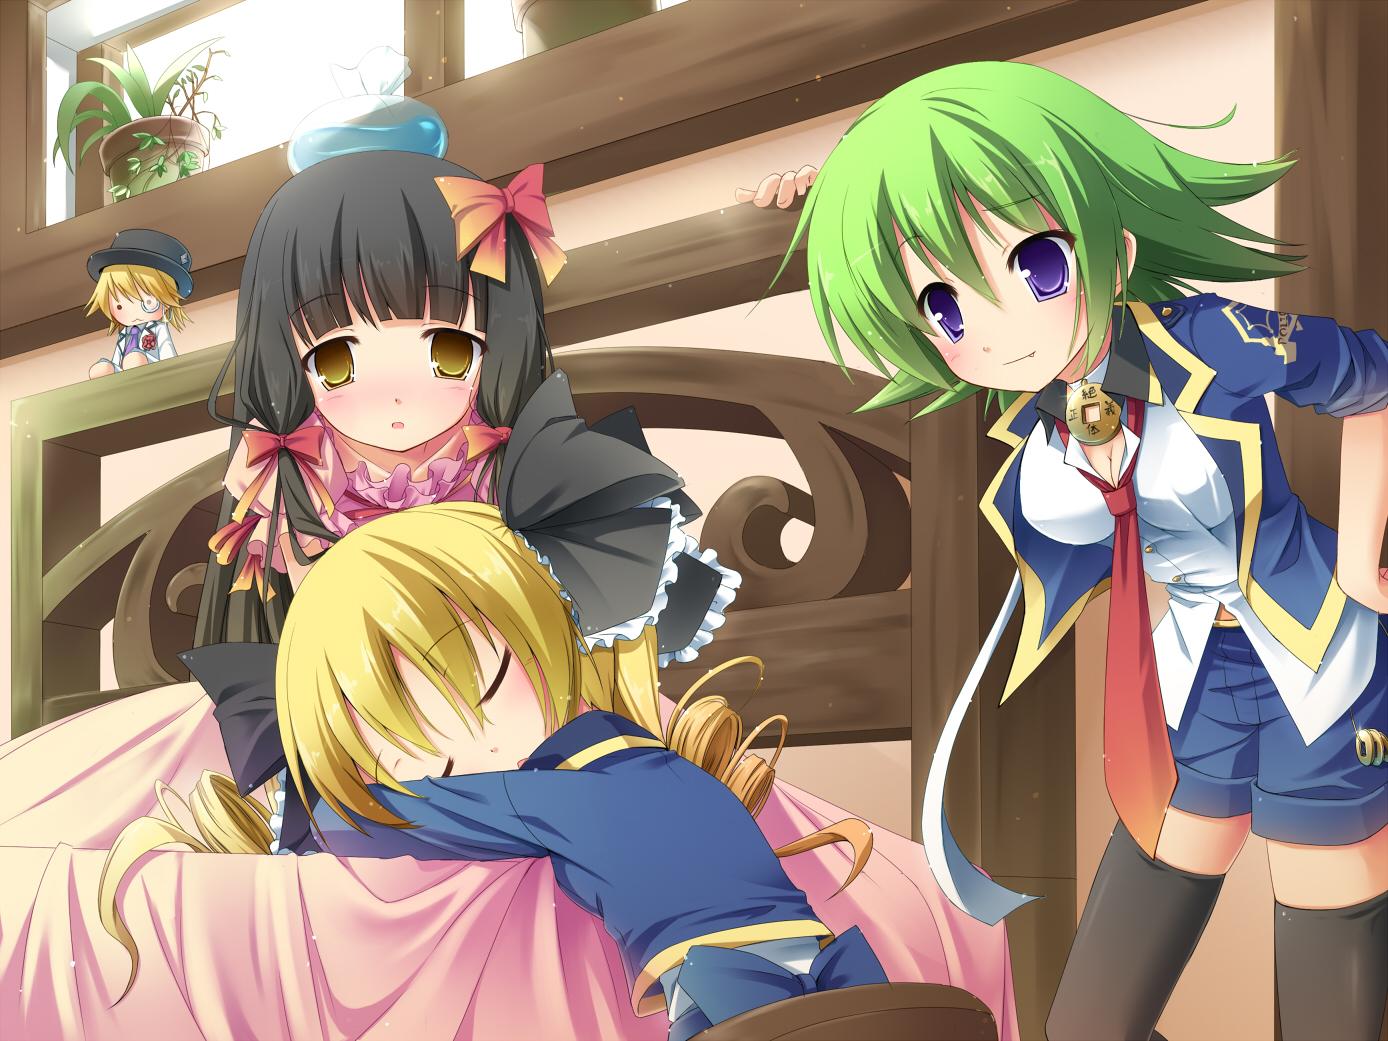 akechi_kokoro hasegawa_hirano masaki_(machisora) tantei_opera_milky_holmes twenty_(character) zenigata_tsugiko